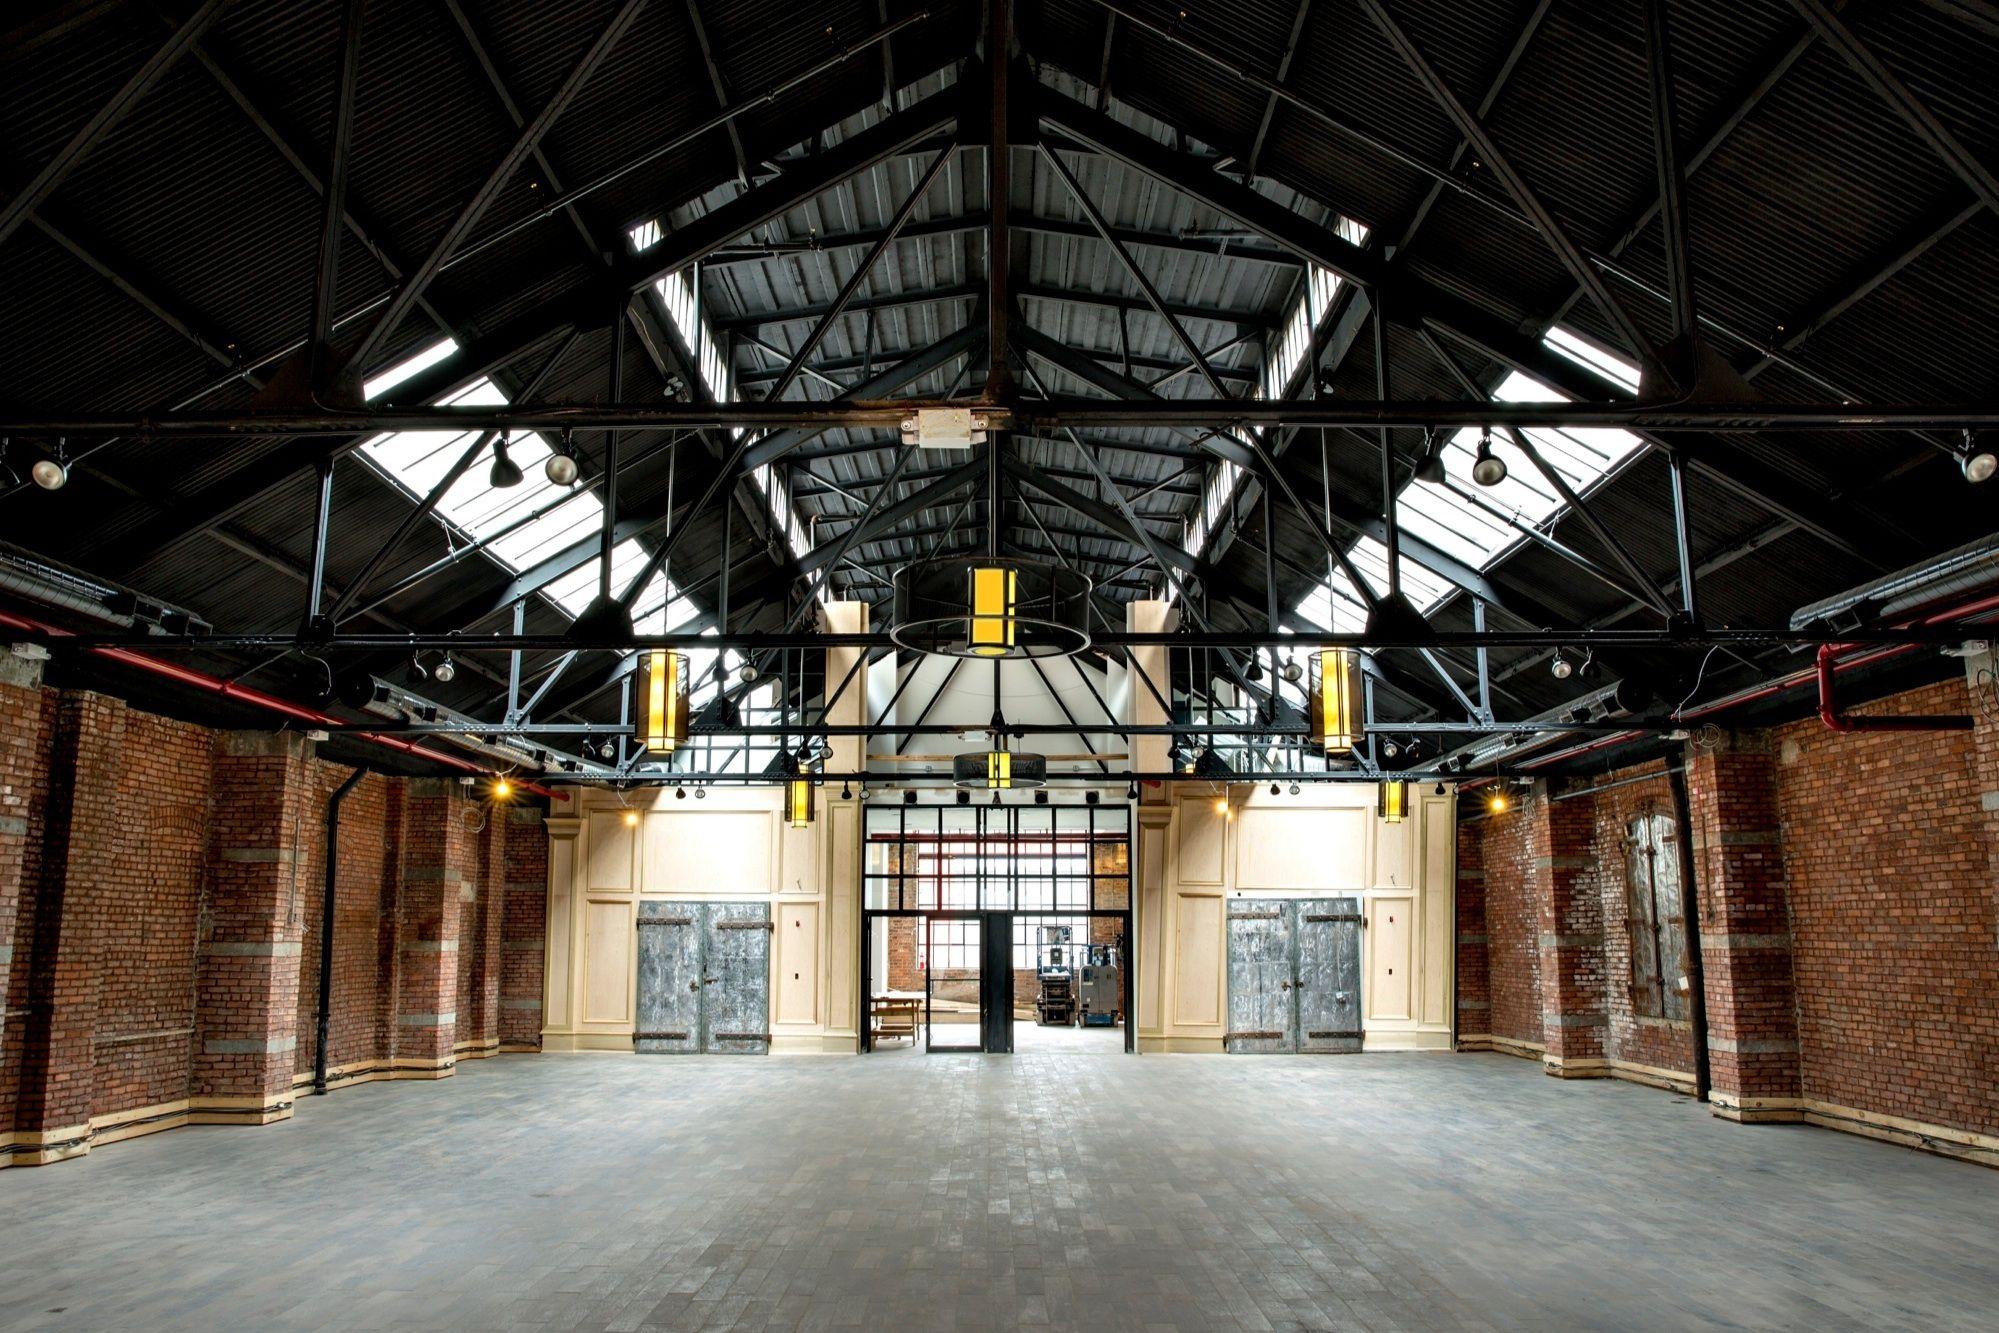 New Venue Space 26 Bridge Street Opens Warehouse design